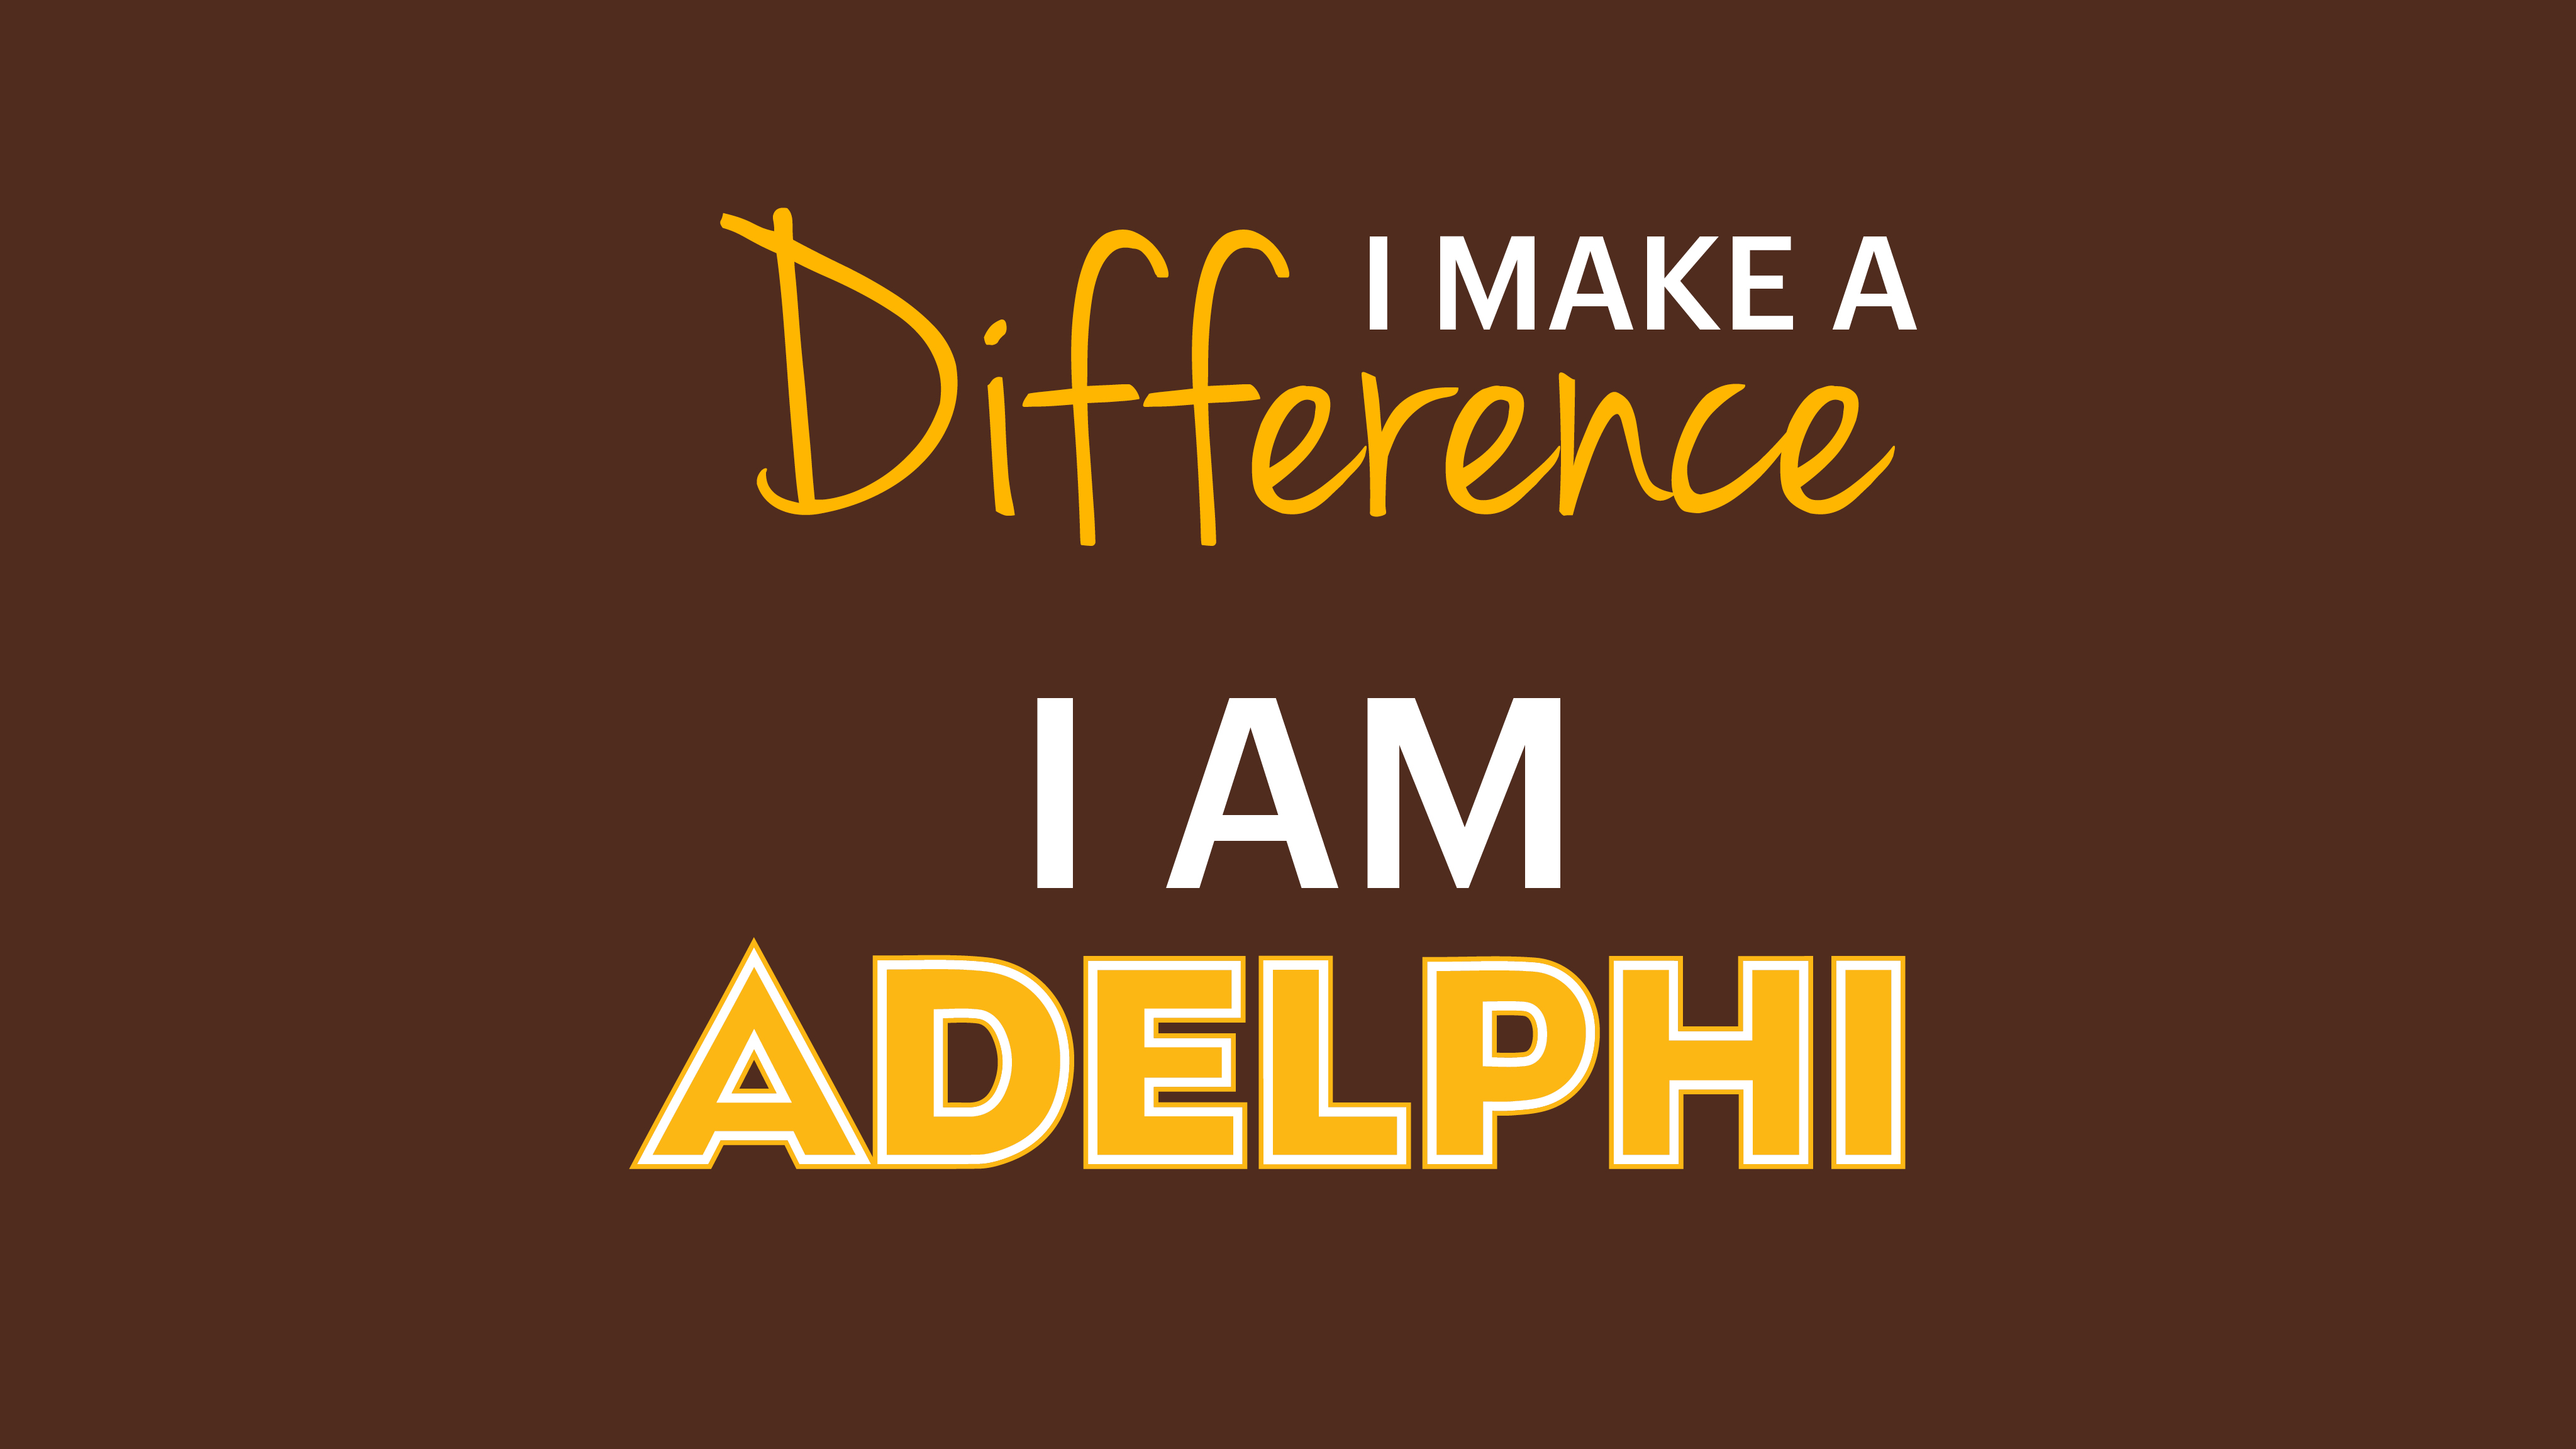 Desktop 16x9 - Adelphi I Make a Difference Wallpaper